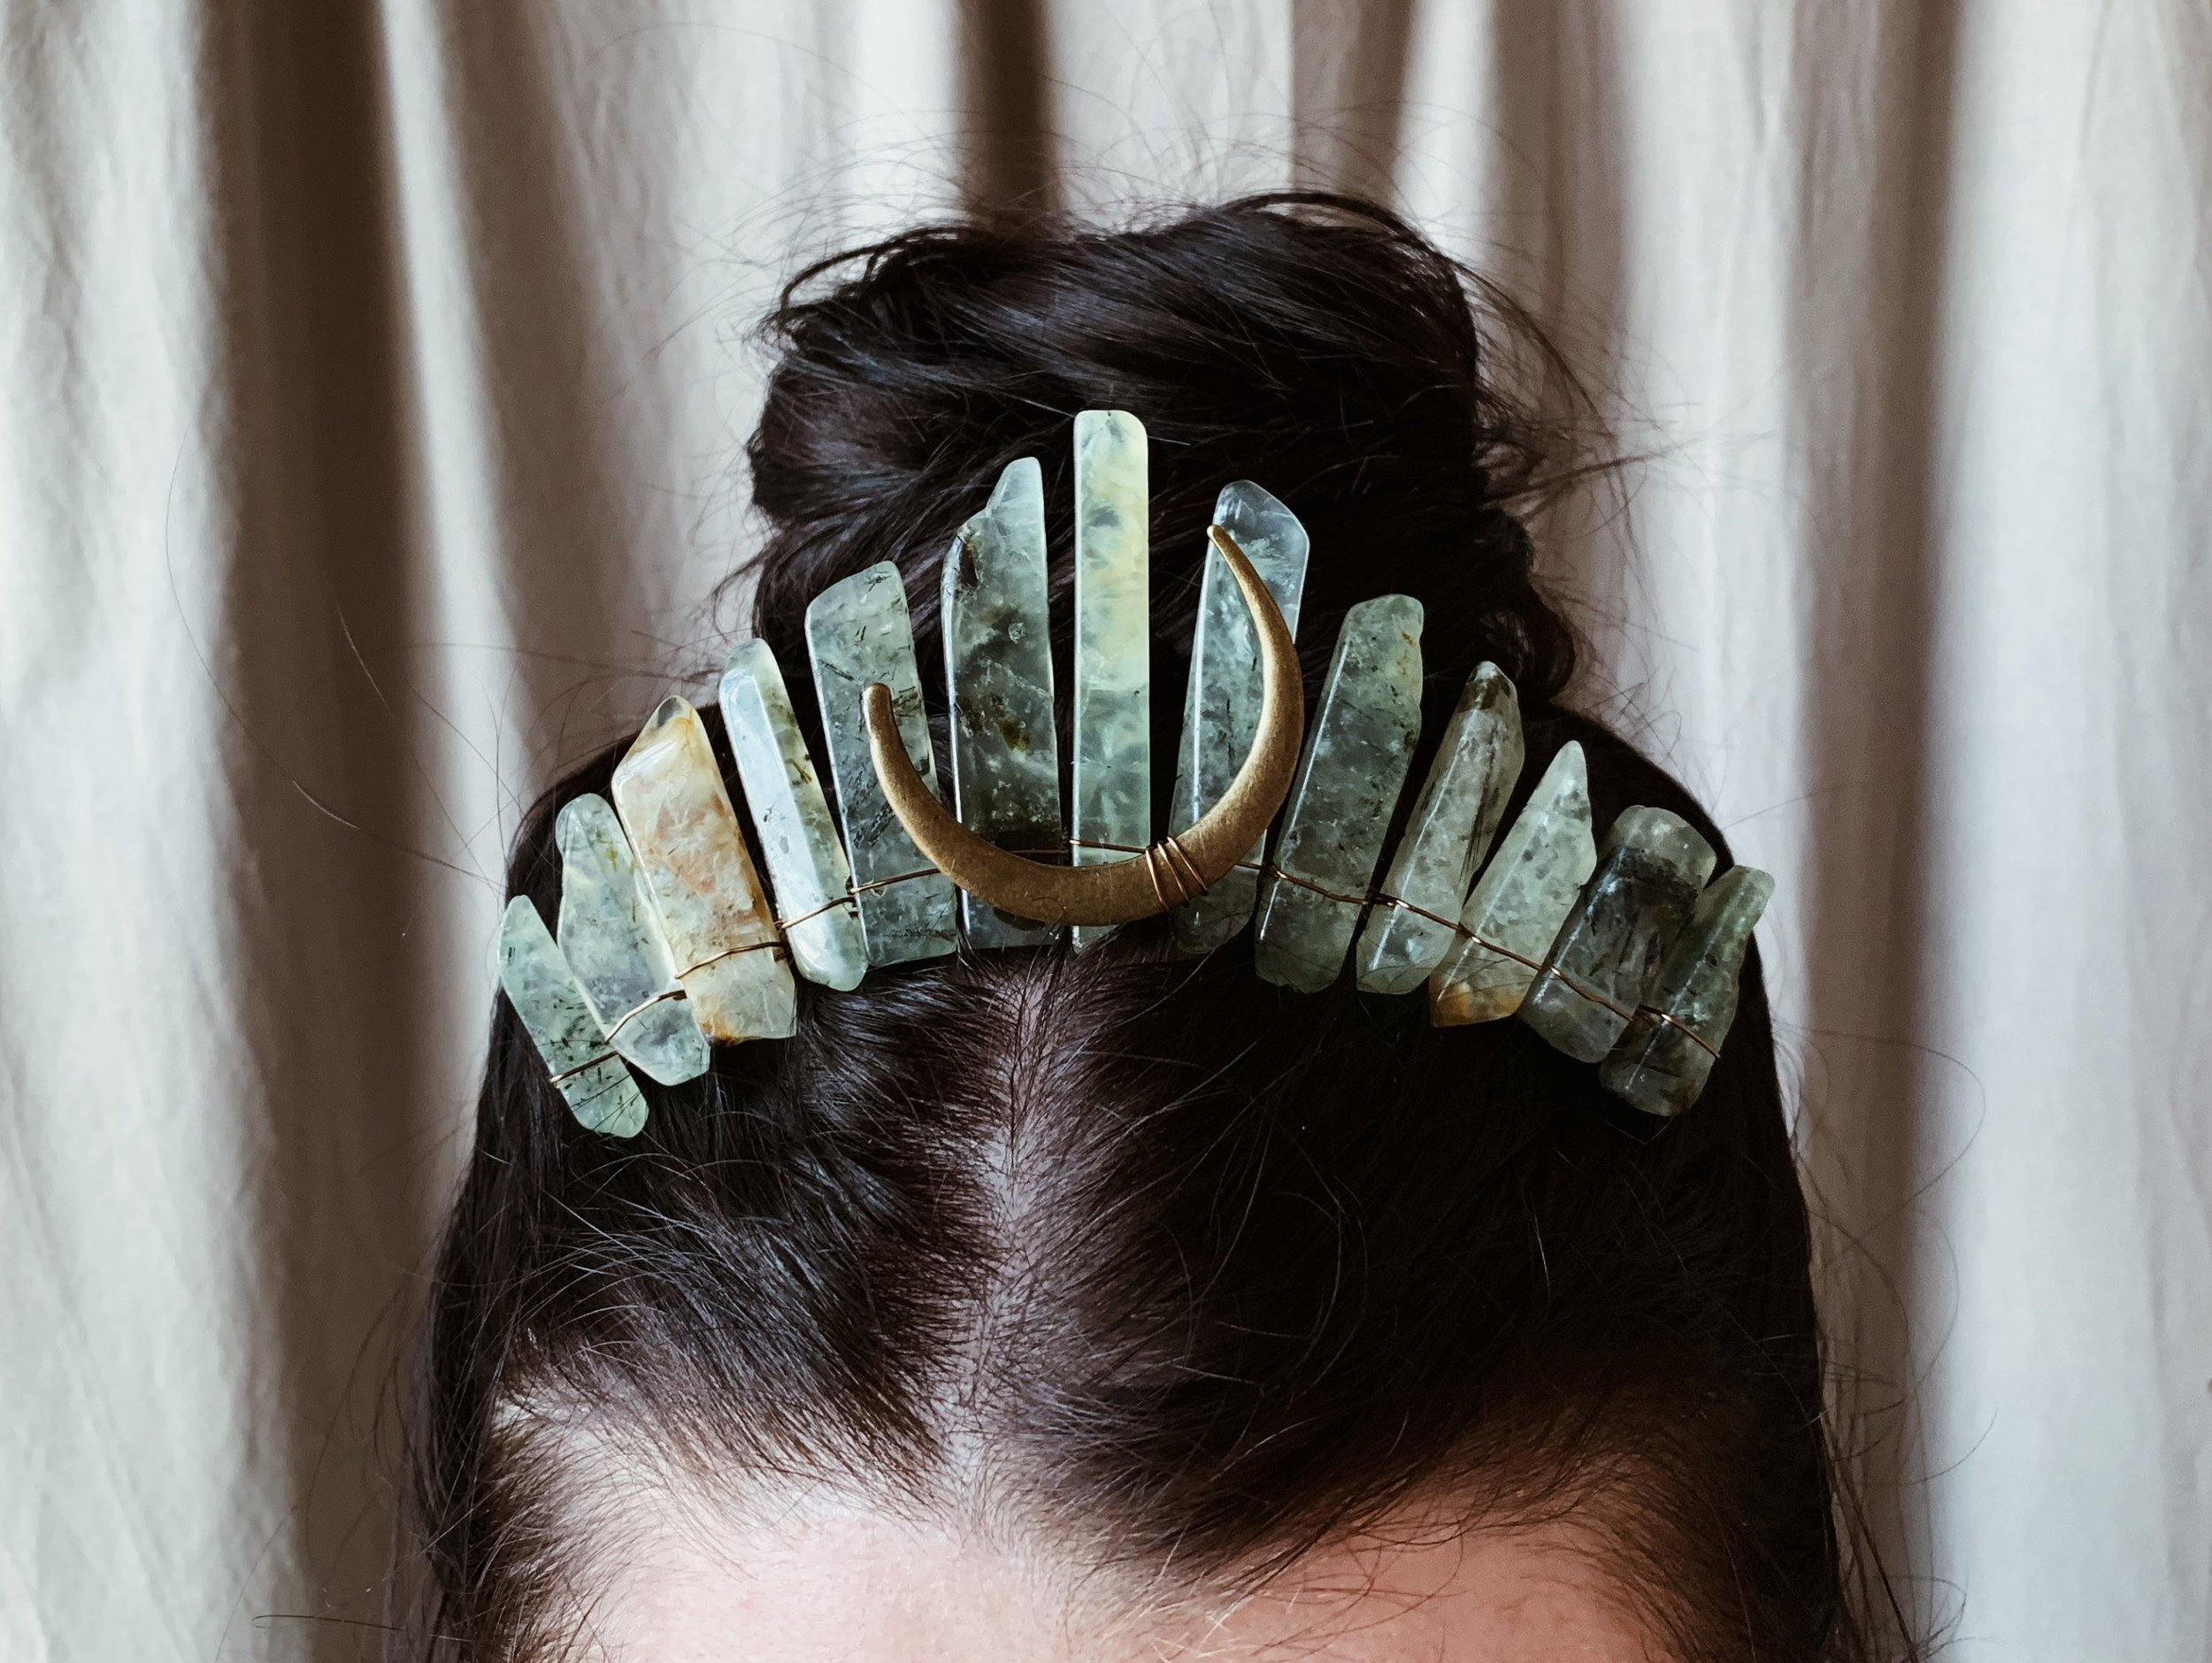 Evergreen Moon Crystal Crown - natural green prehnite stone tiara, magical witchy moon headpiece, mystical fantasy boho hair comb crown